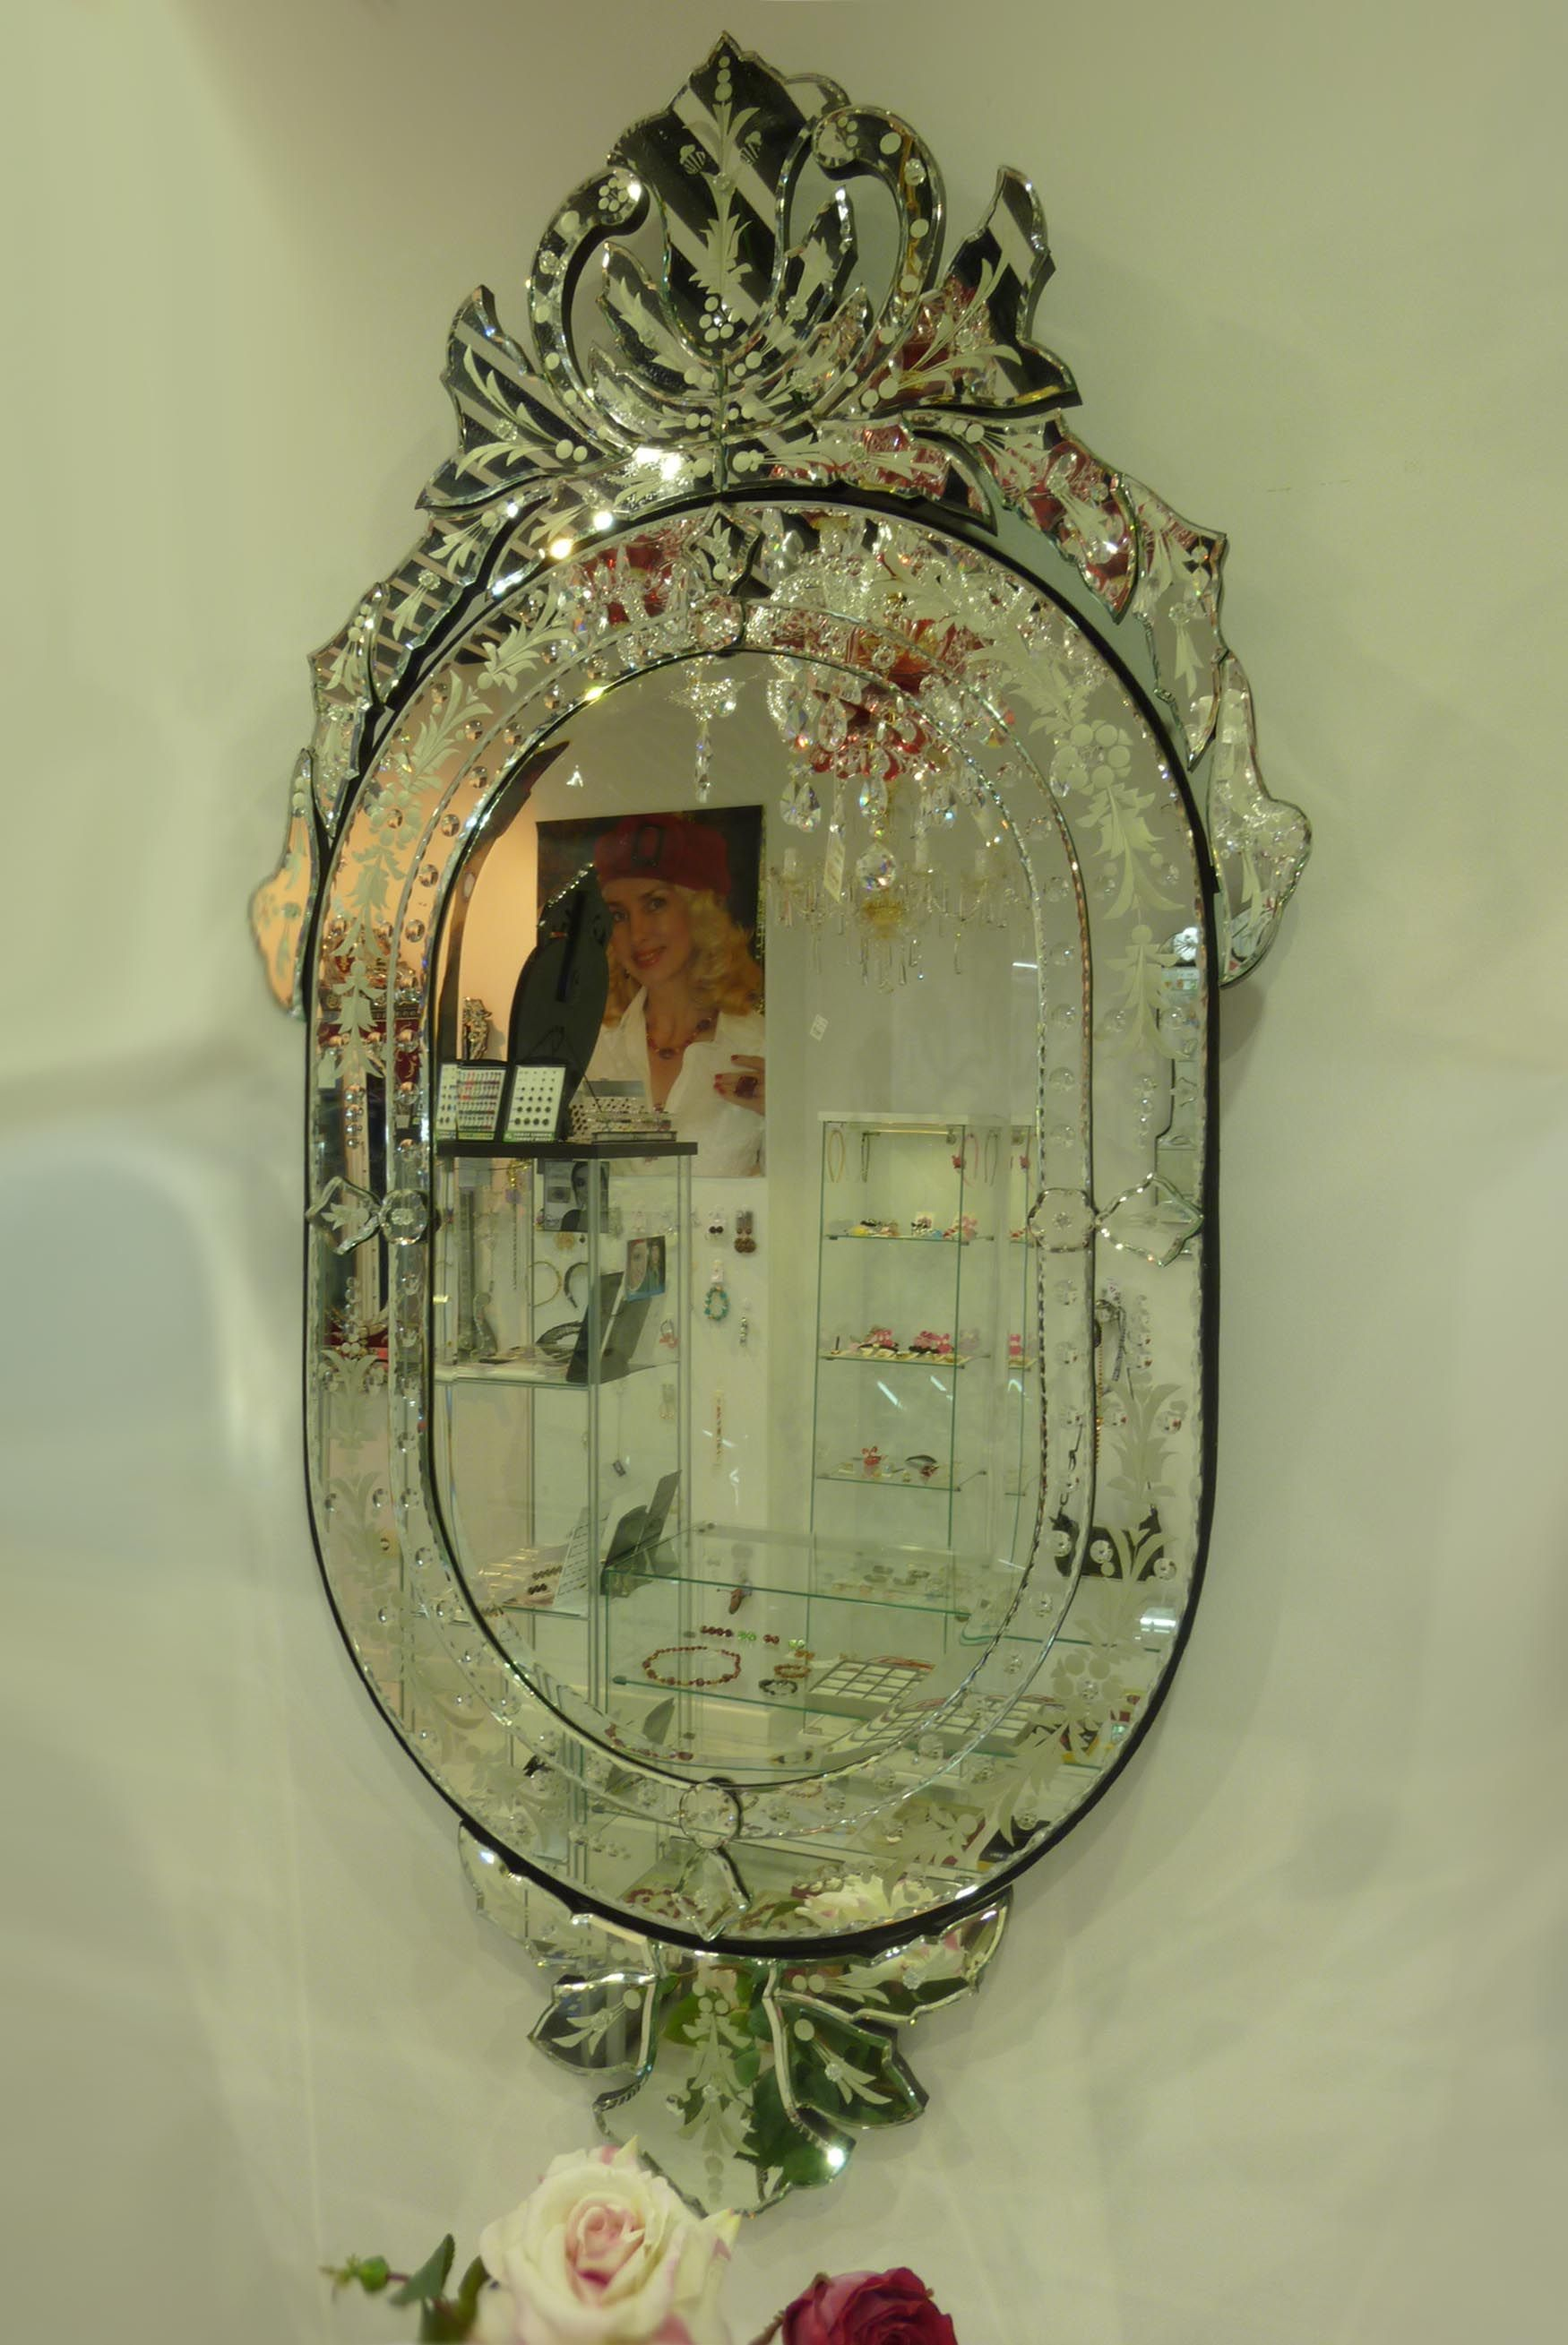 venezianischer spiegel brescia dekoration beltr n ihr. Black Bedroom Furniture Sets. Home Design Ideas